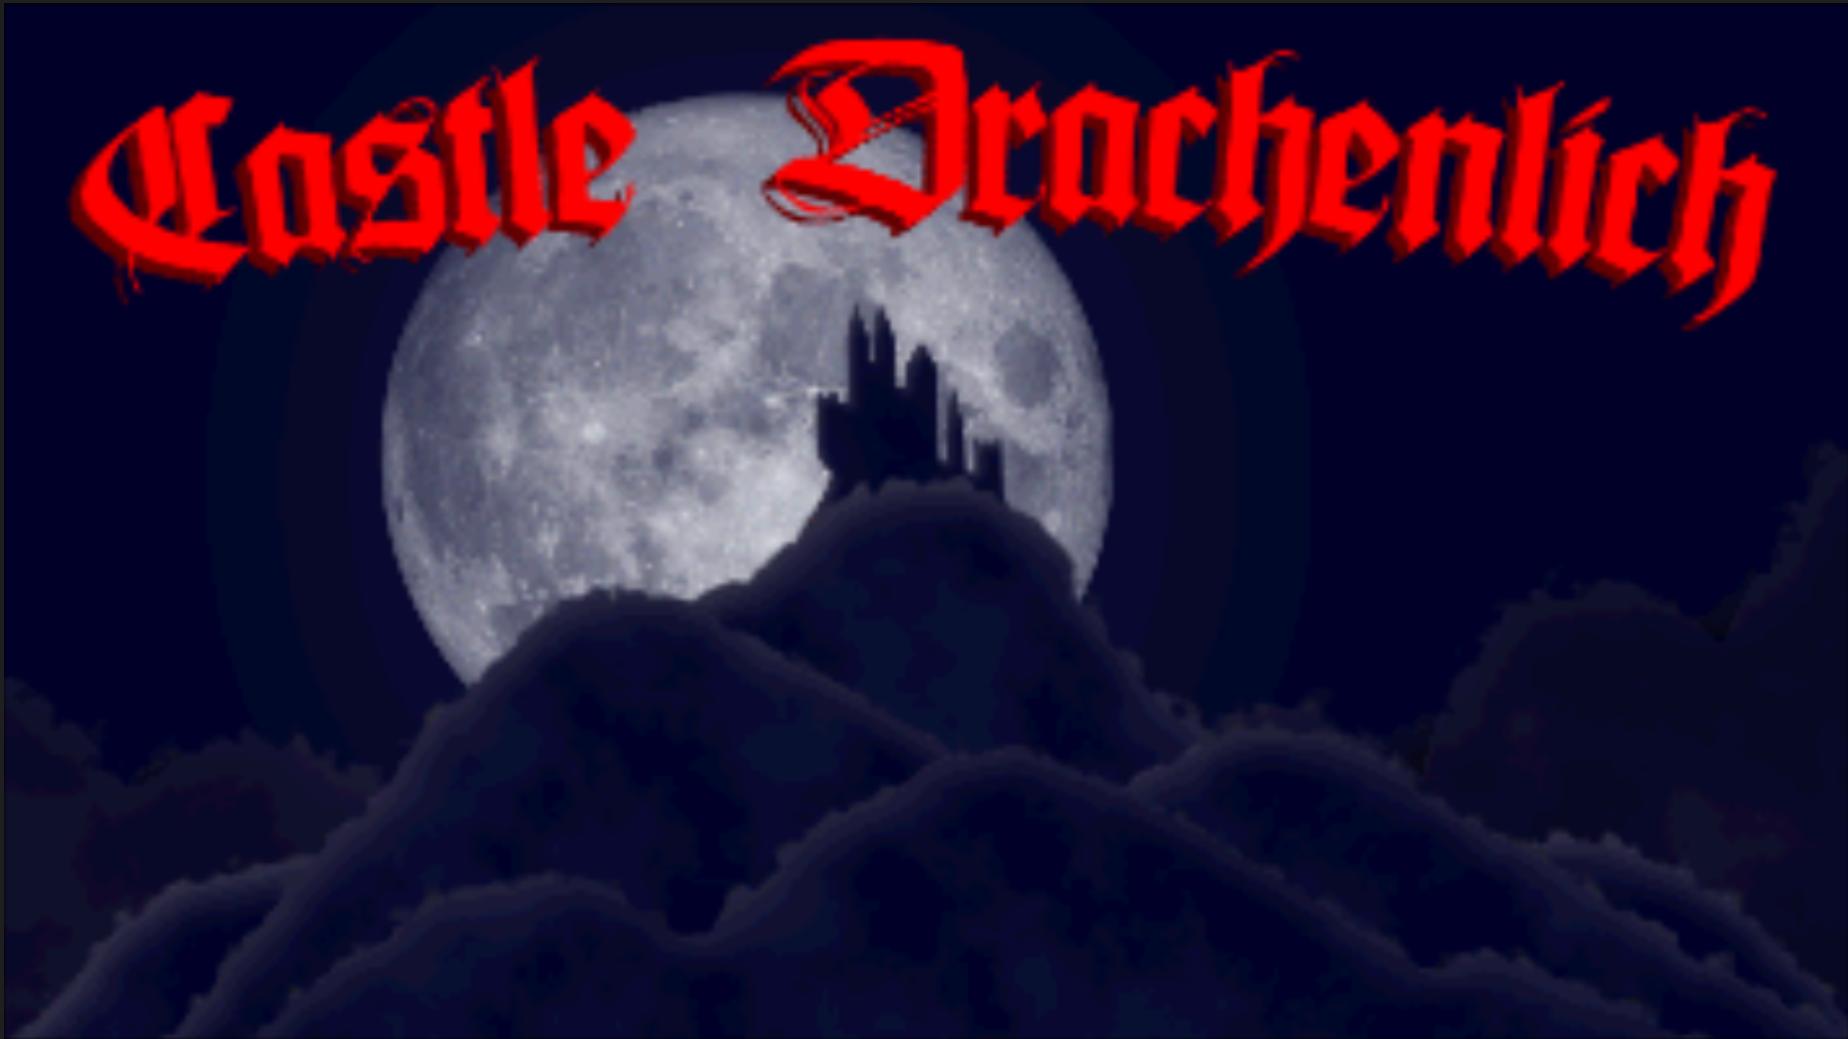 Castle Drachenlich